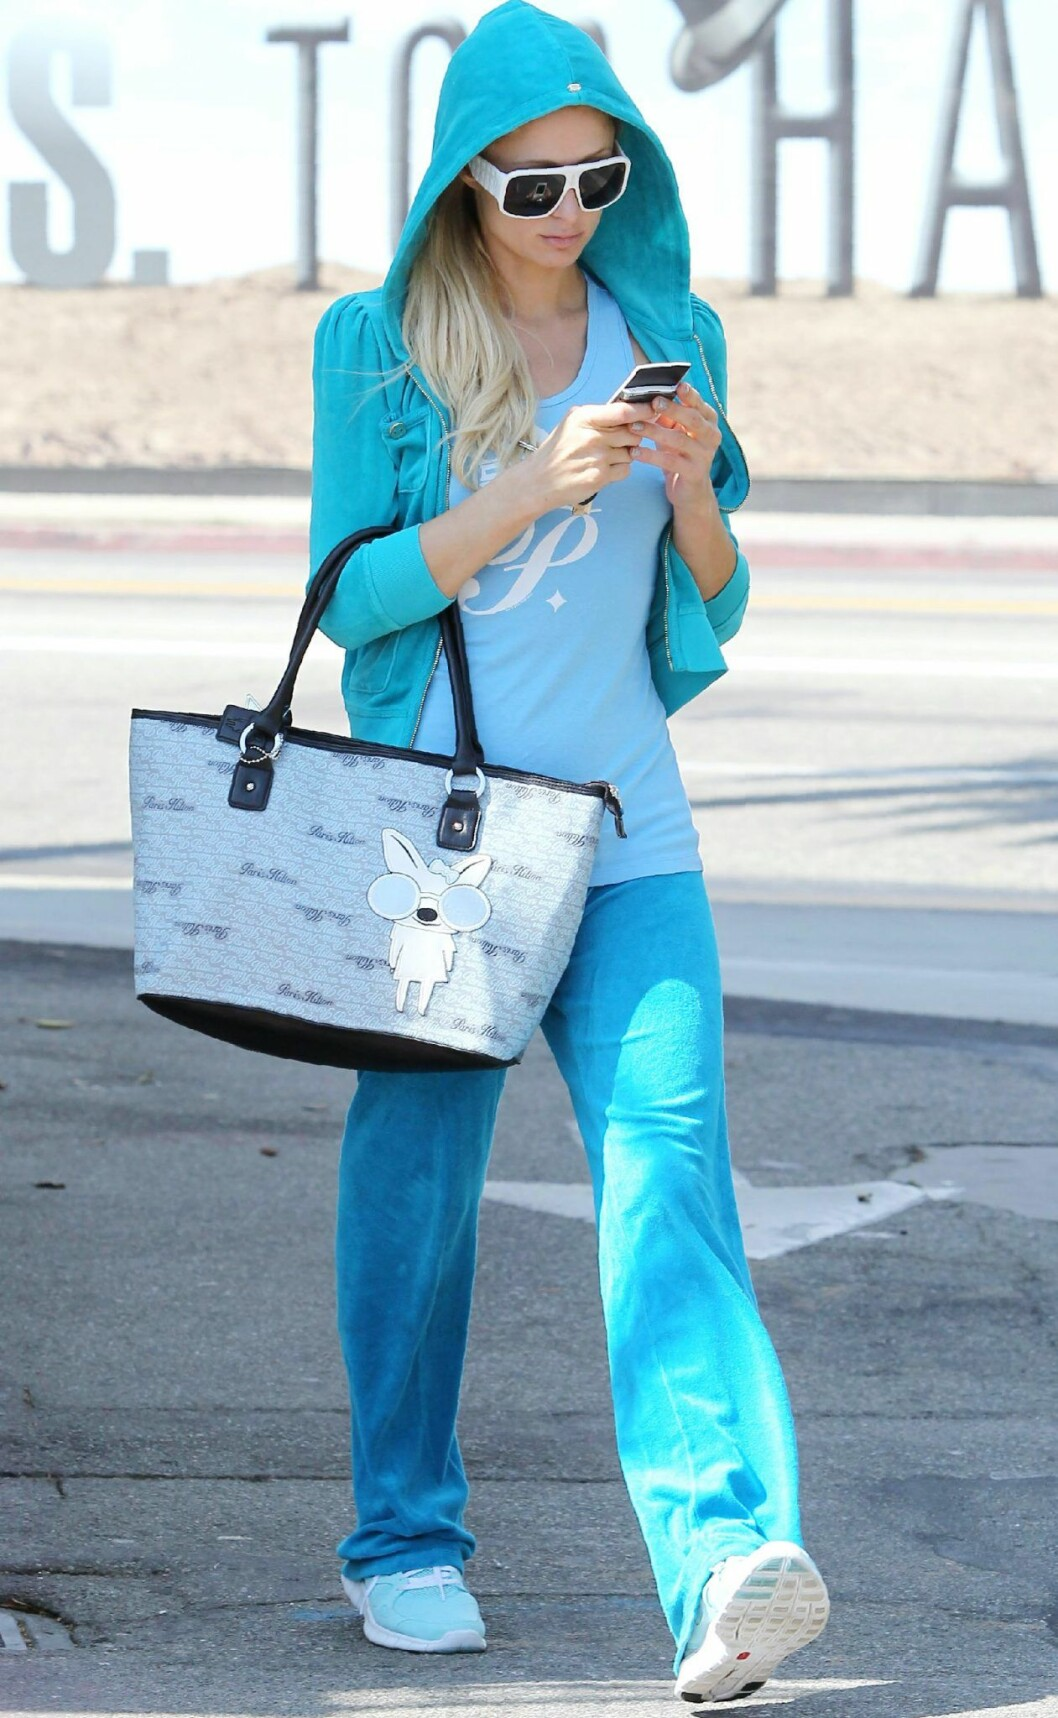 Paris Hilton i turkos juicy couture